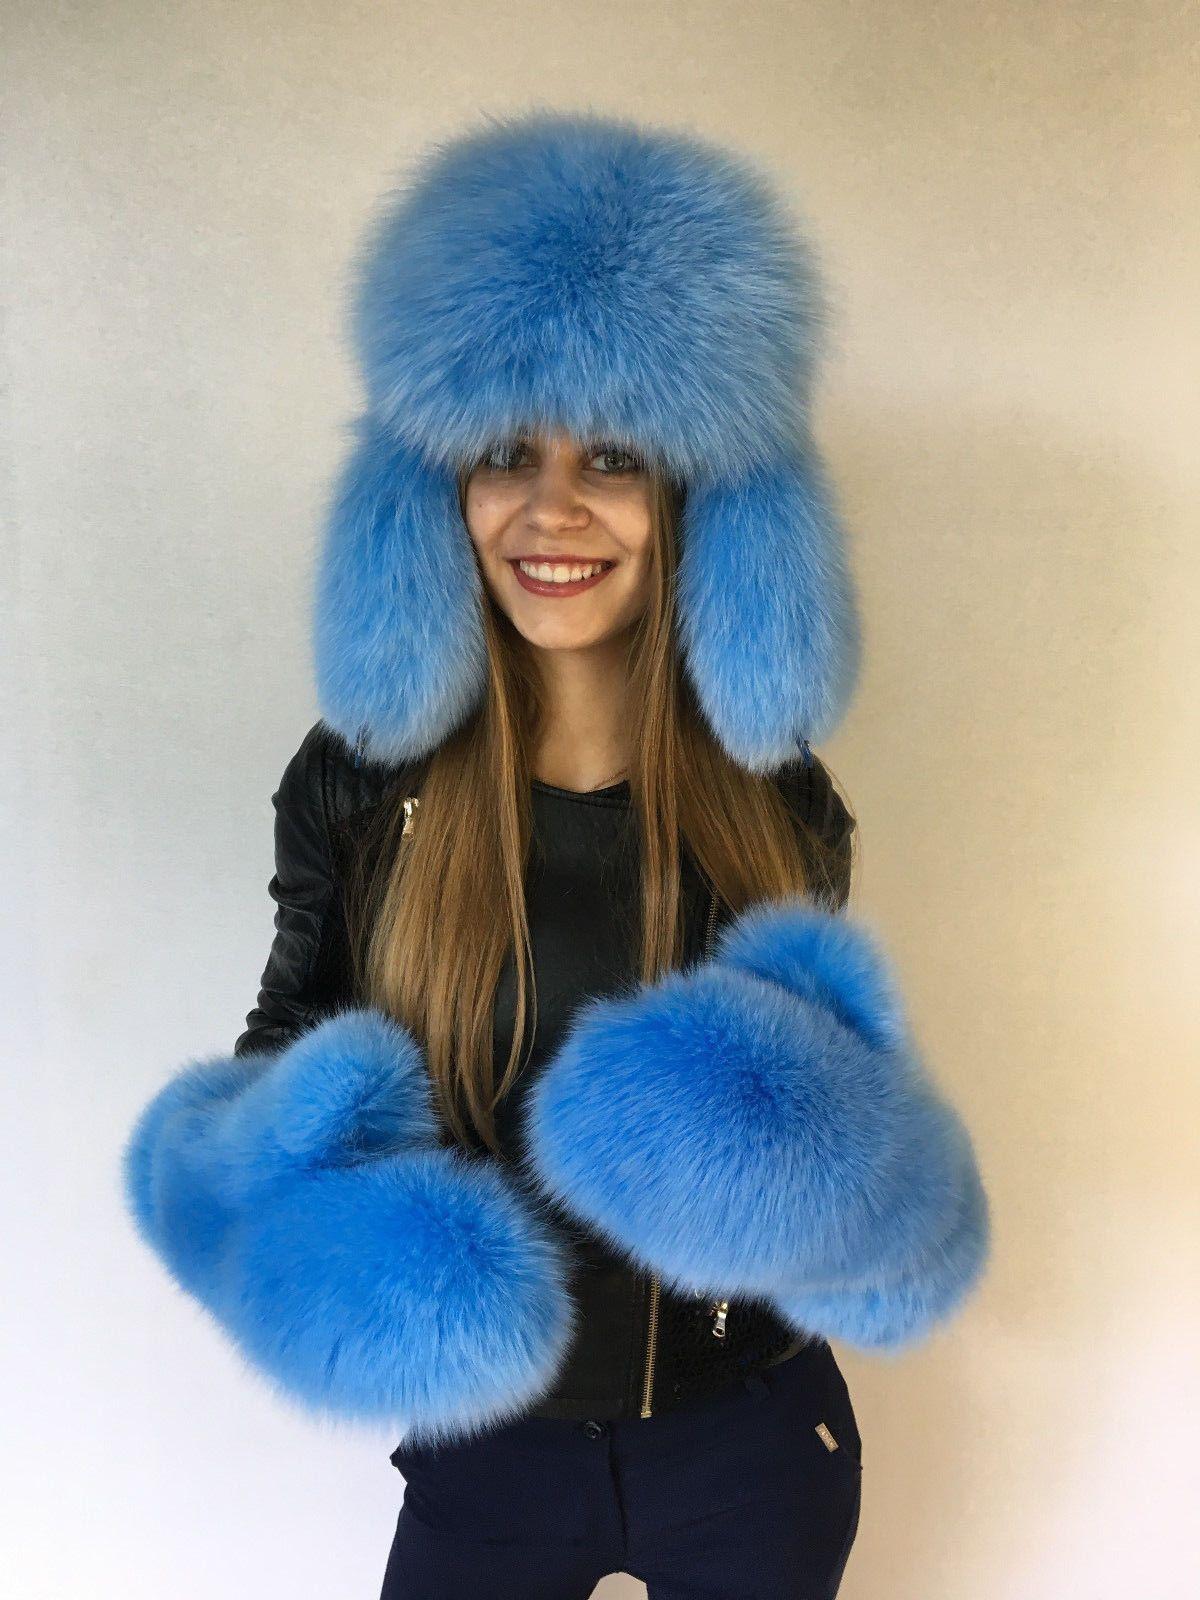 e37f27d4 SAGA QUALITY - All Item Have Saga Furs Labels. Material: Real Genuine  Regular Dyed Arctic Fox Fur. Other: Adjustable on Wrist.